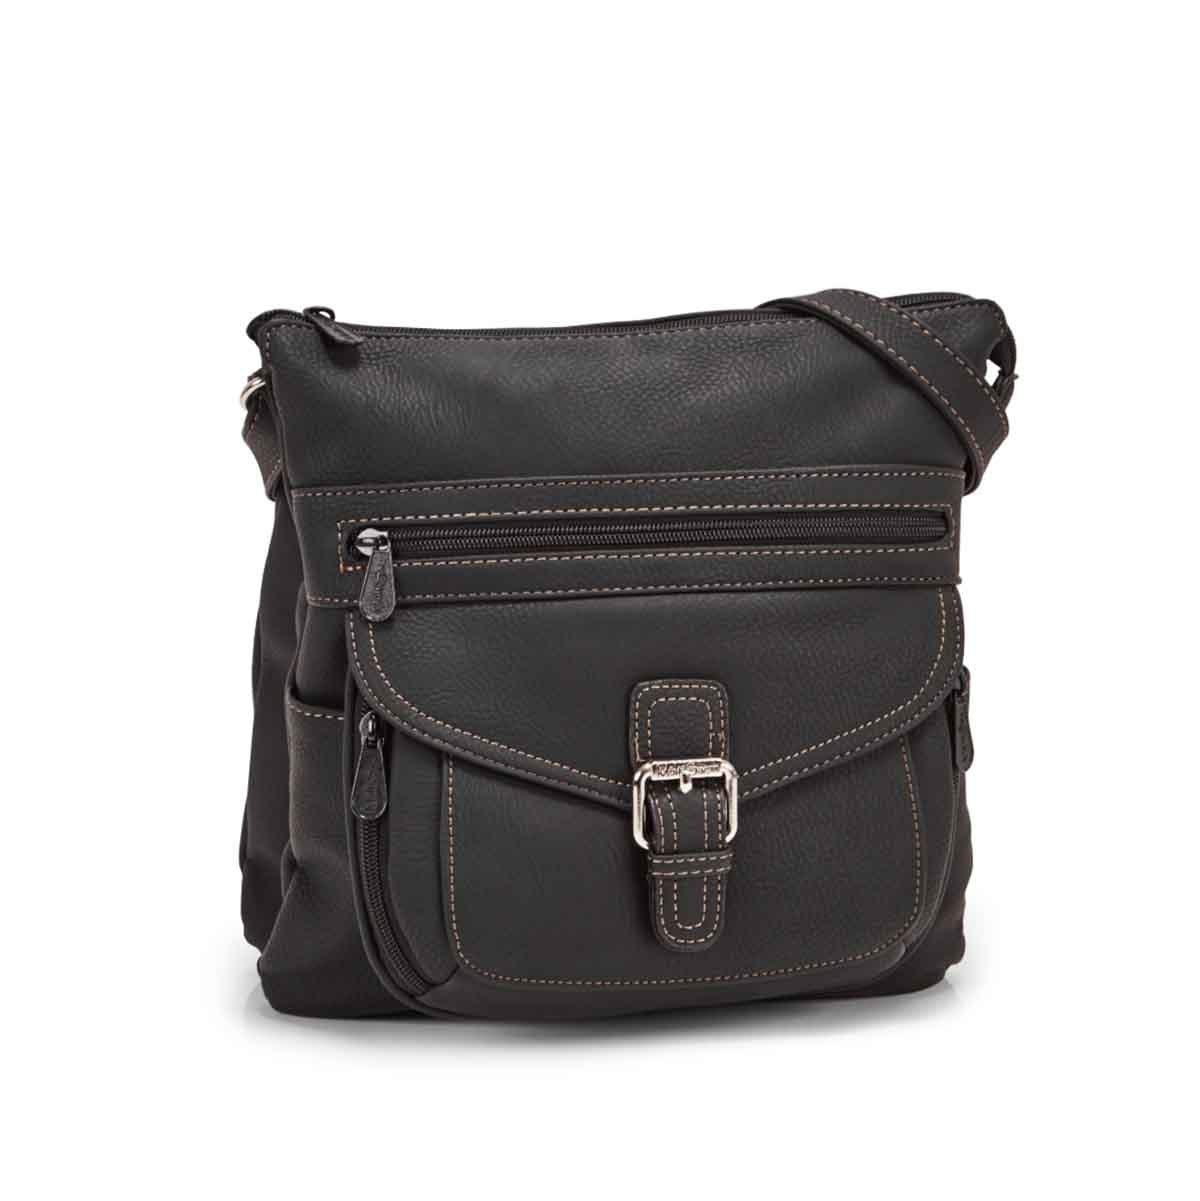 Women's CONTOUR black cross body bag